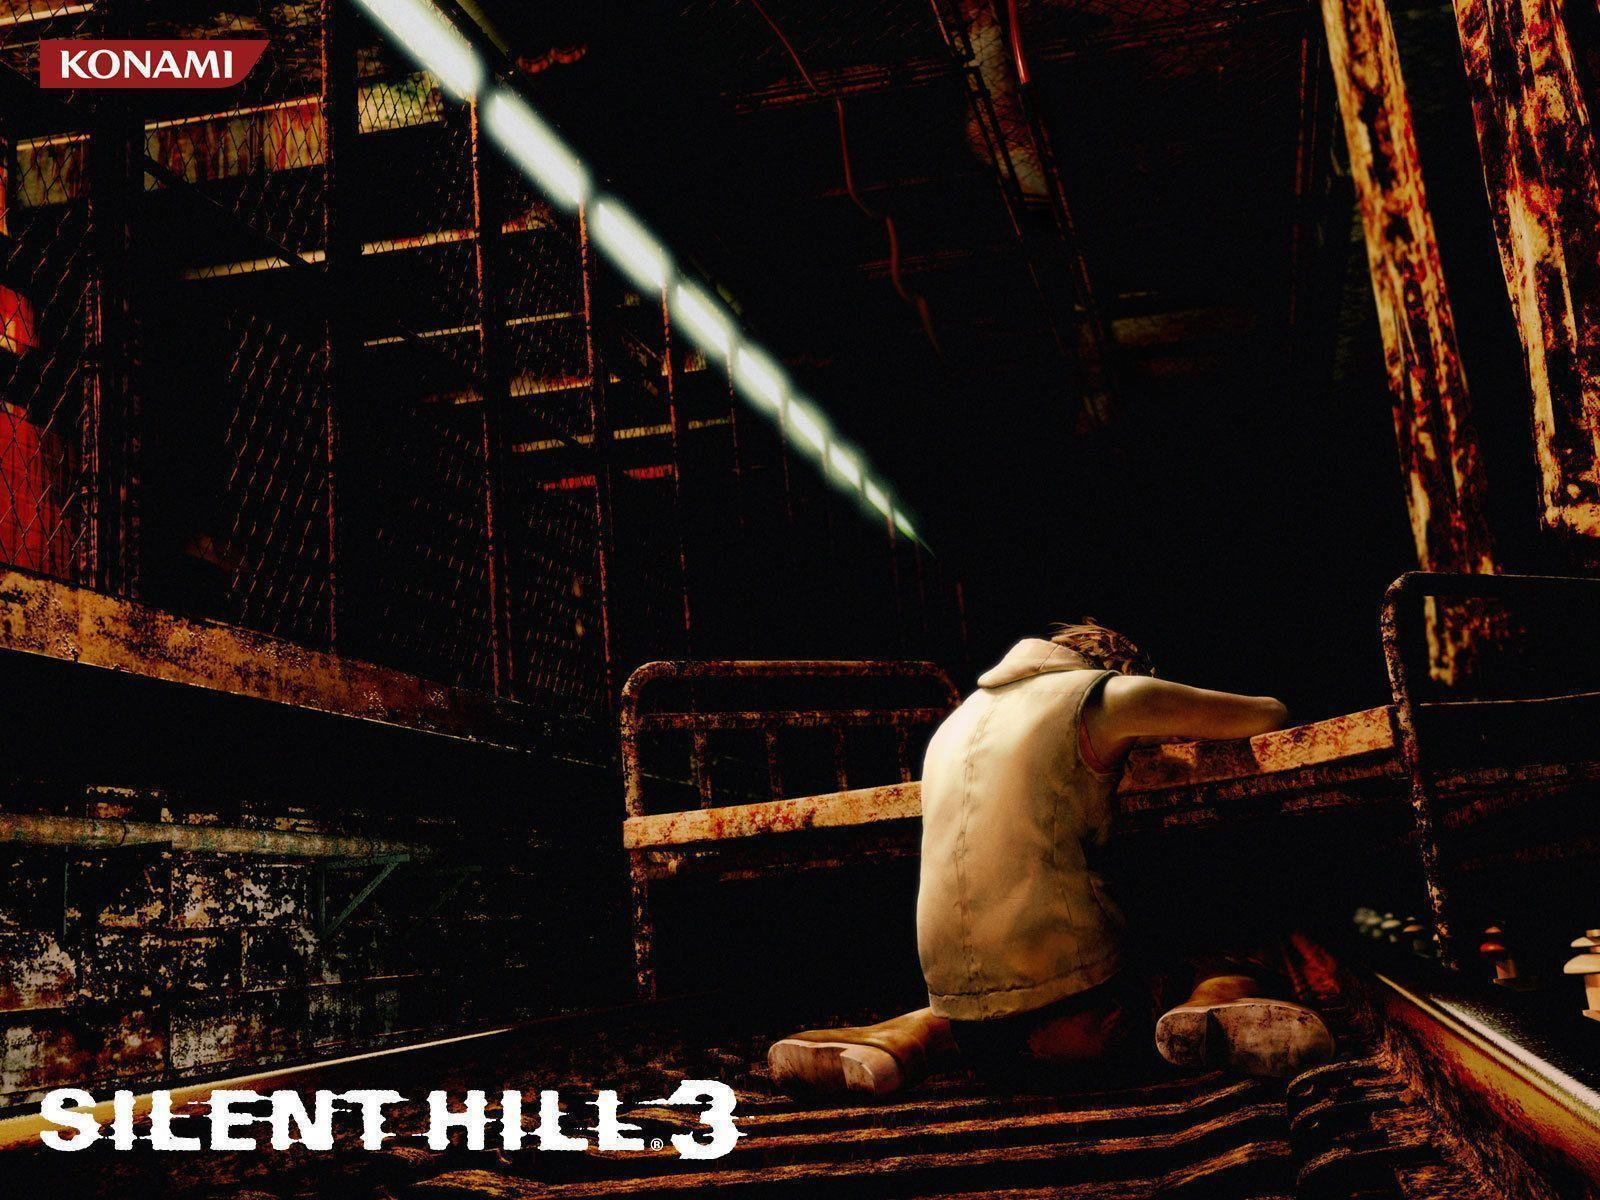 Silent hill 2 ost black fairy - 5 6